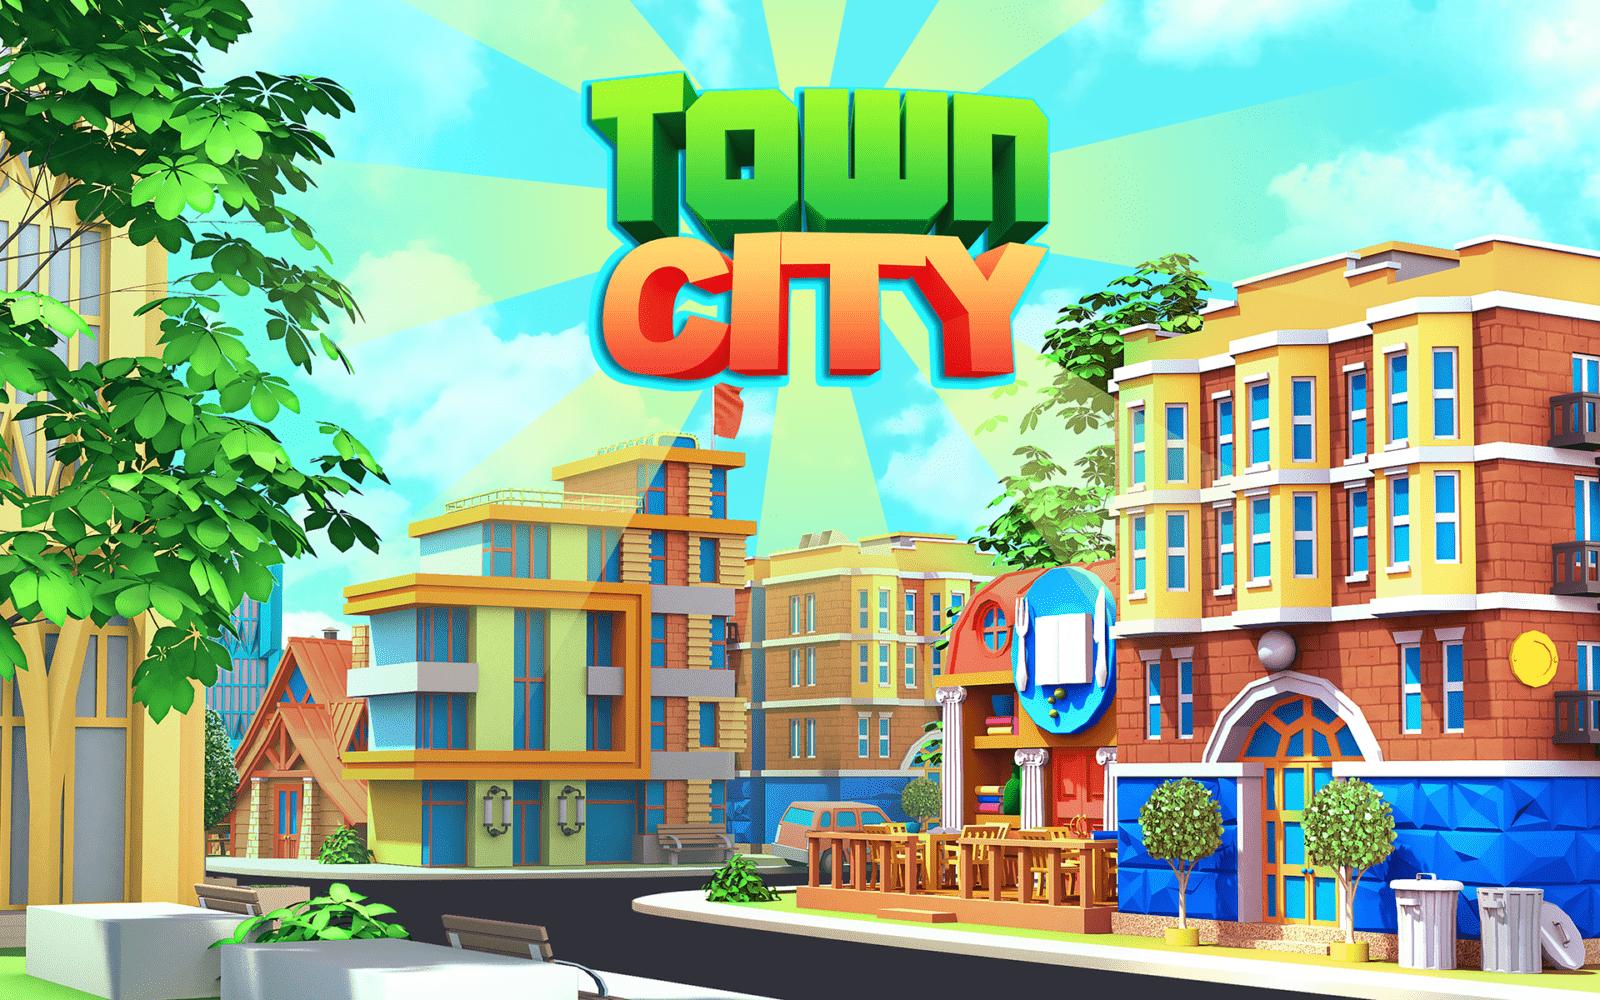 indigo.2018.towncity.sparkingcity.ss (2)